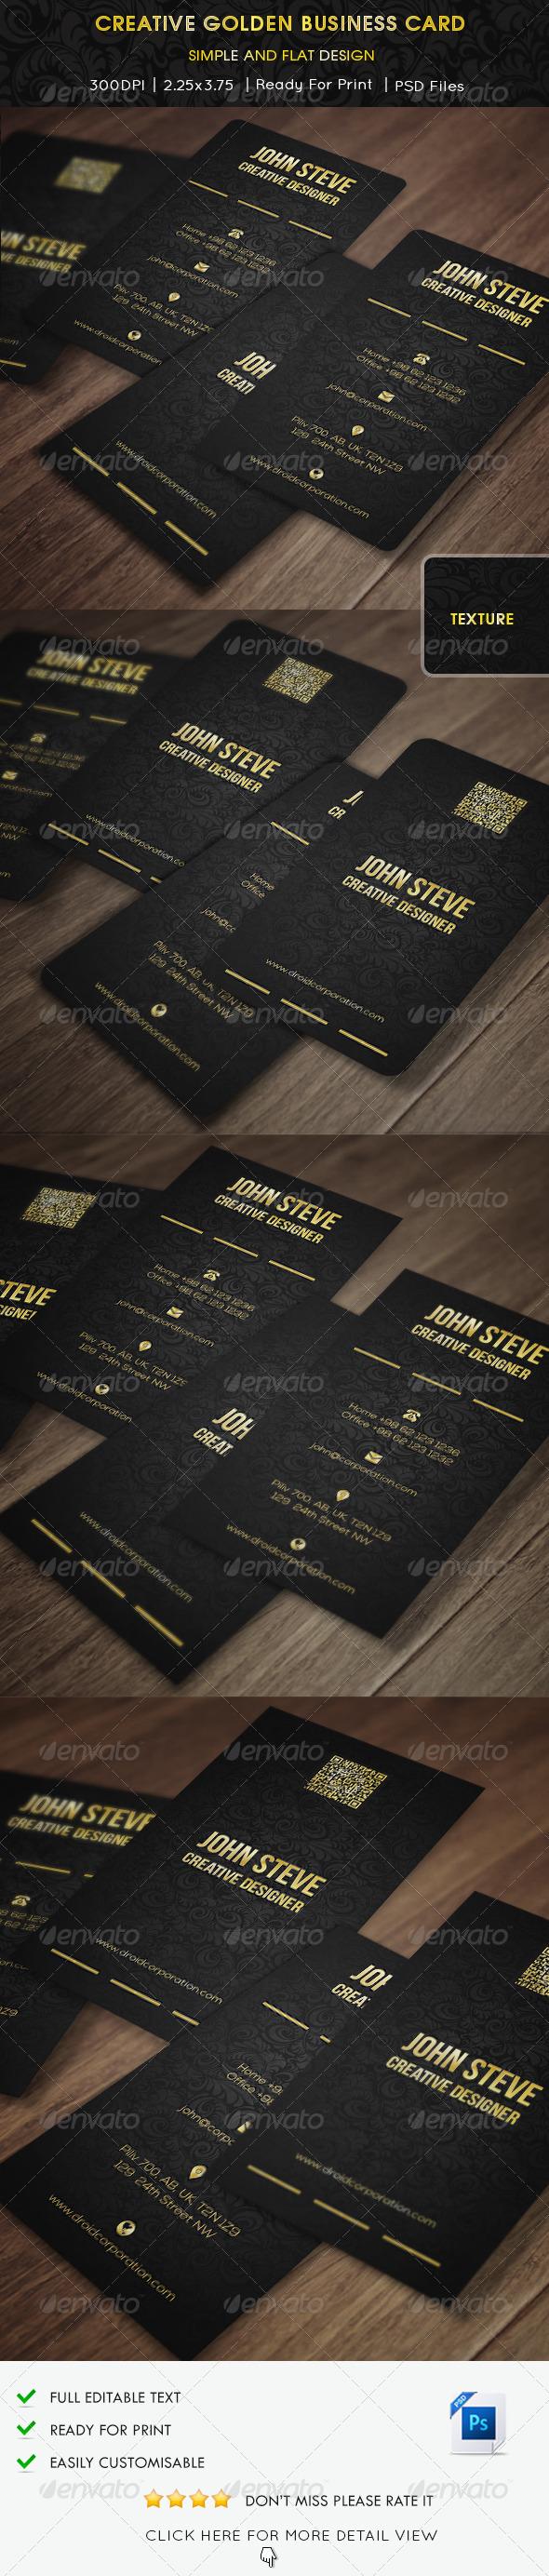 Creative Golden Business Card - Creative Business Cards